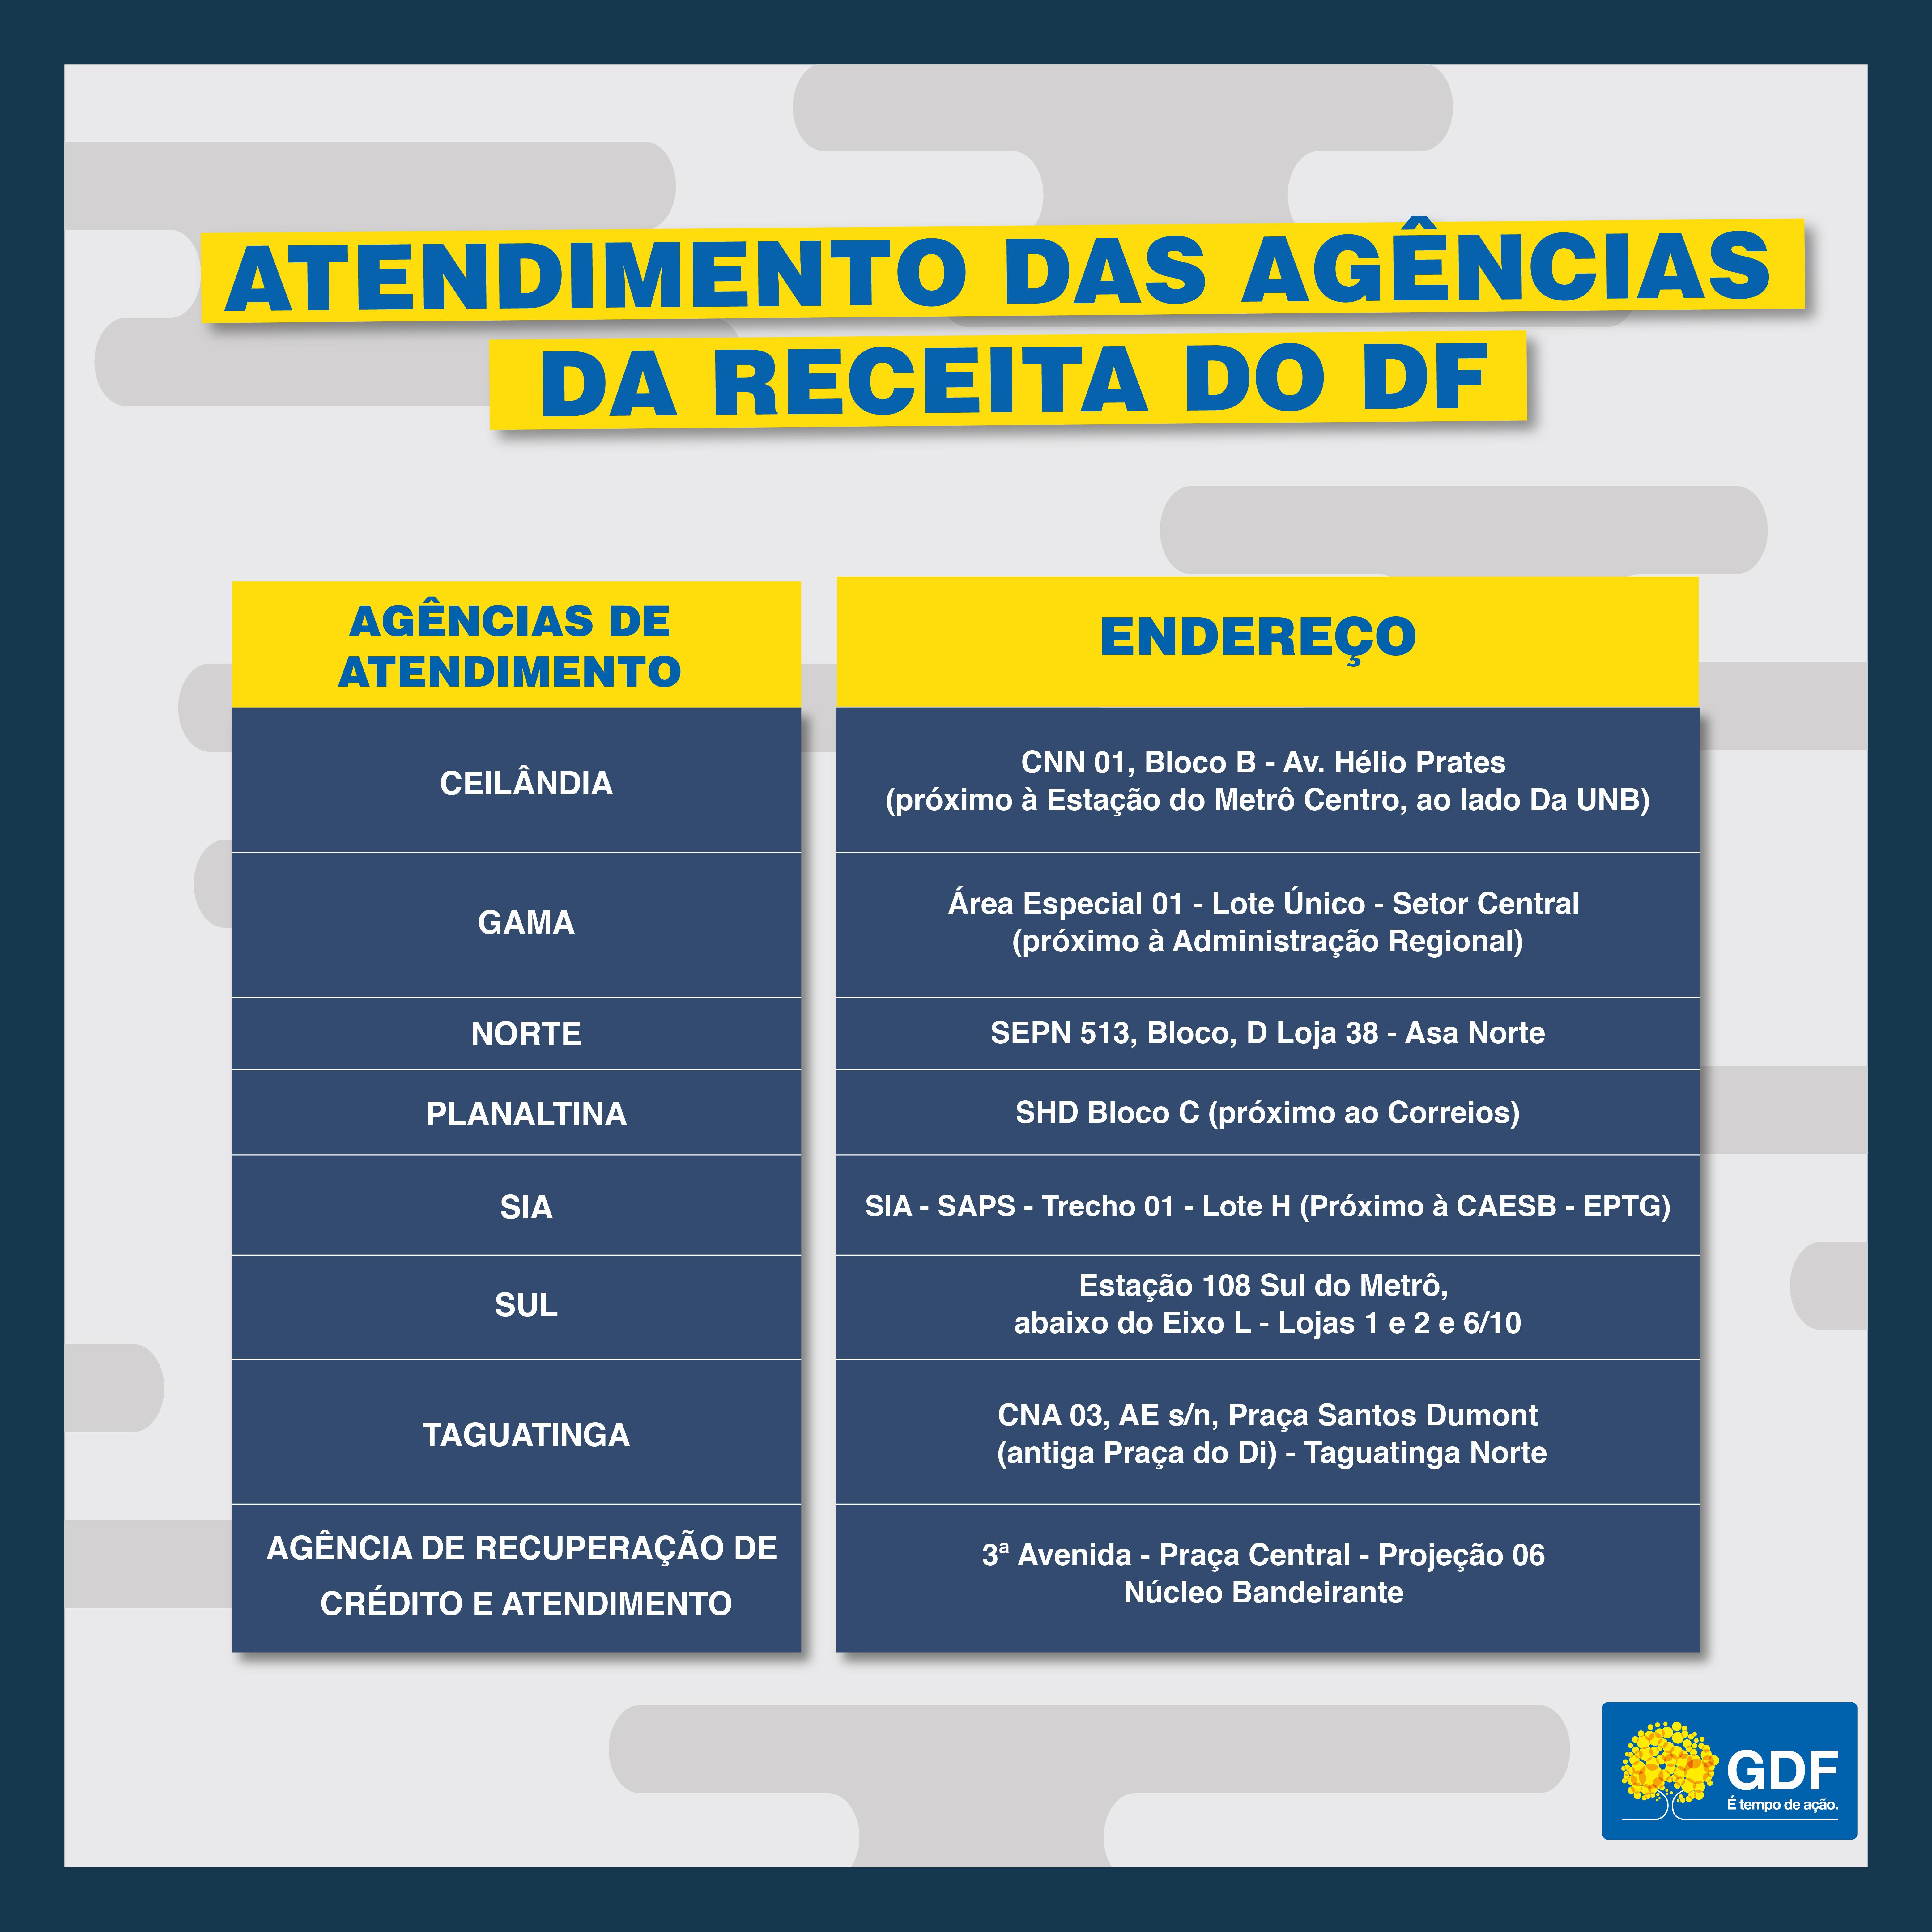 Arte: Édipo Torres/Agência Brasília